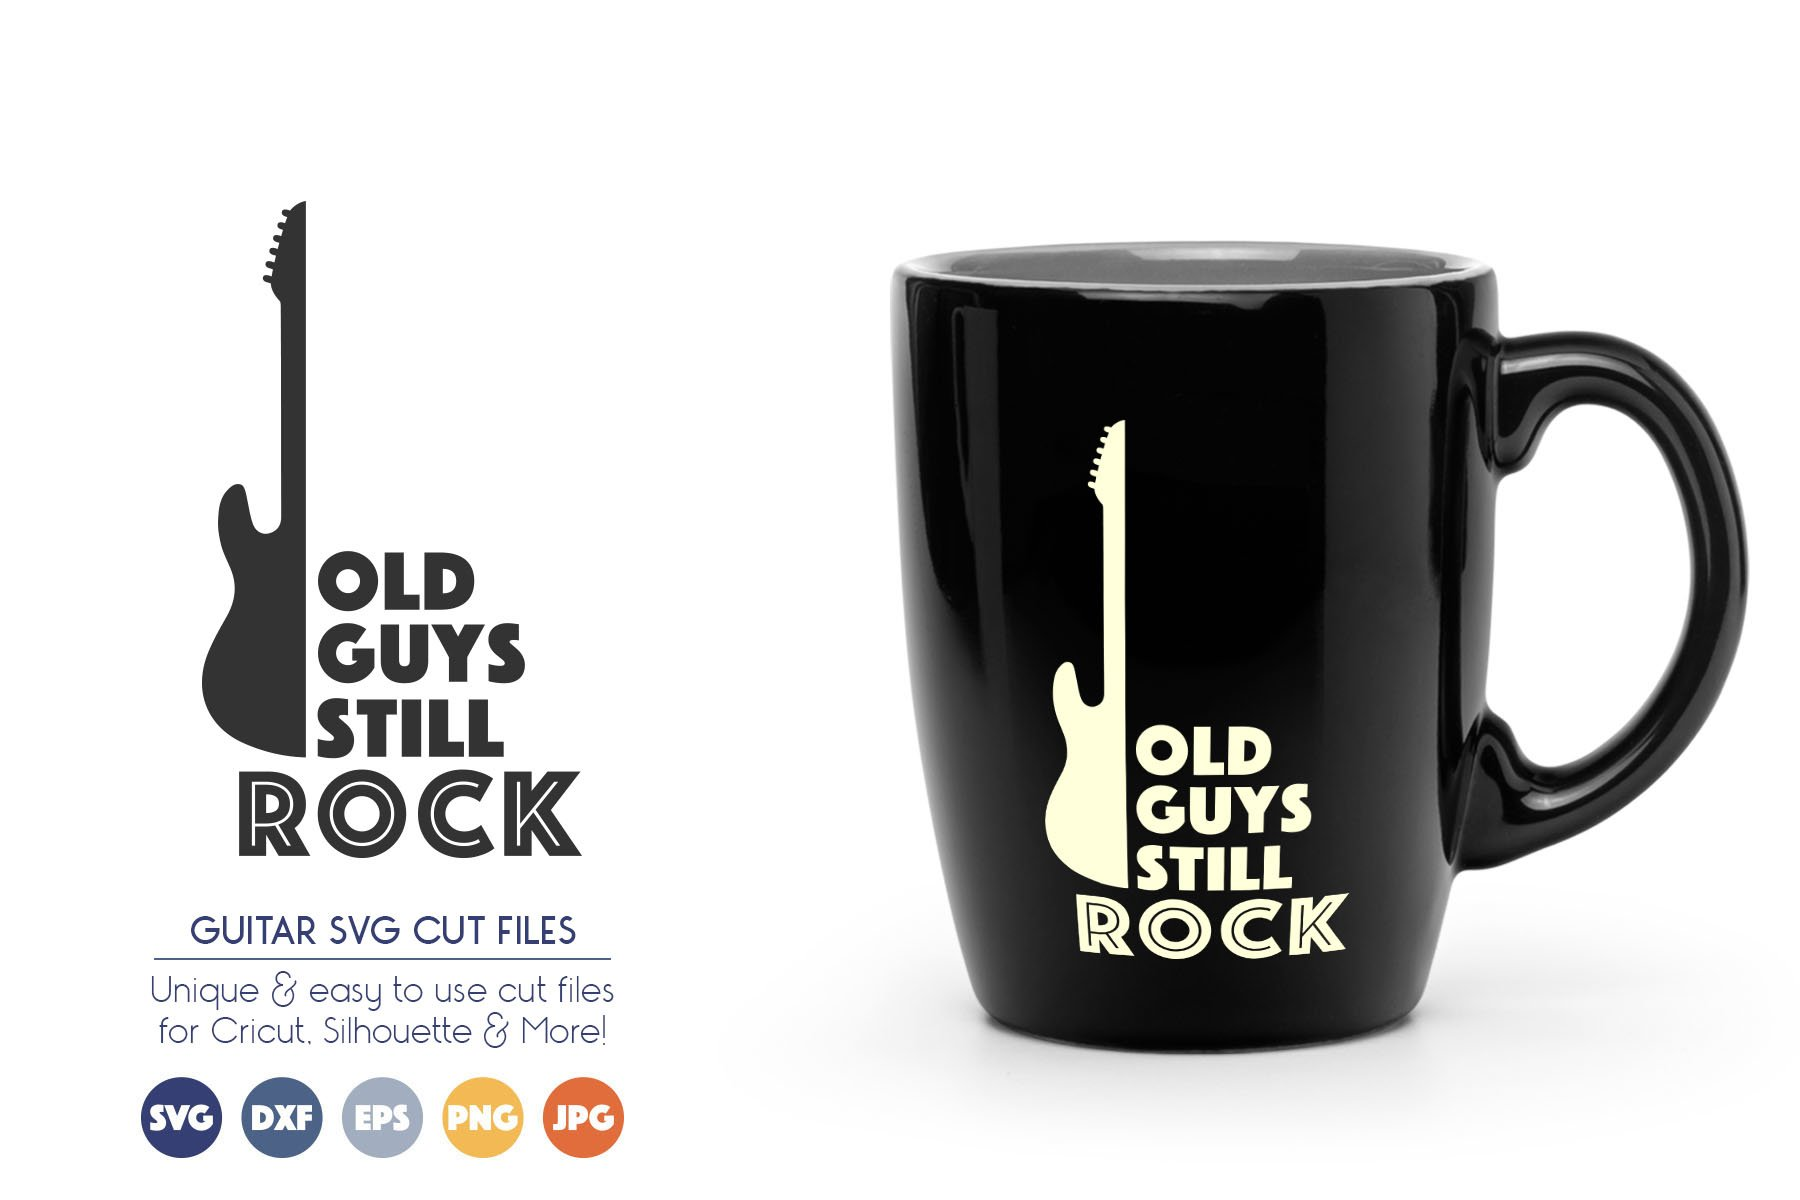 Guitar SVG Cut Files - Old Guys Still Rock example image 1